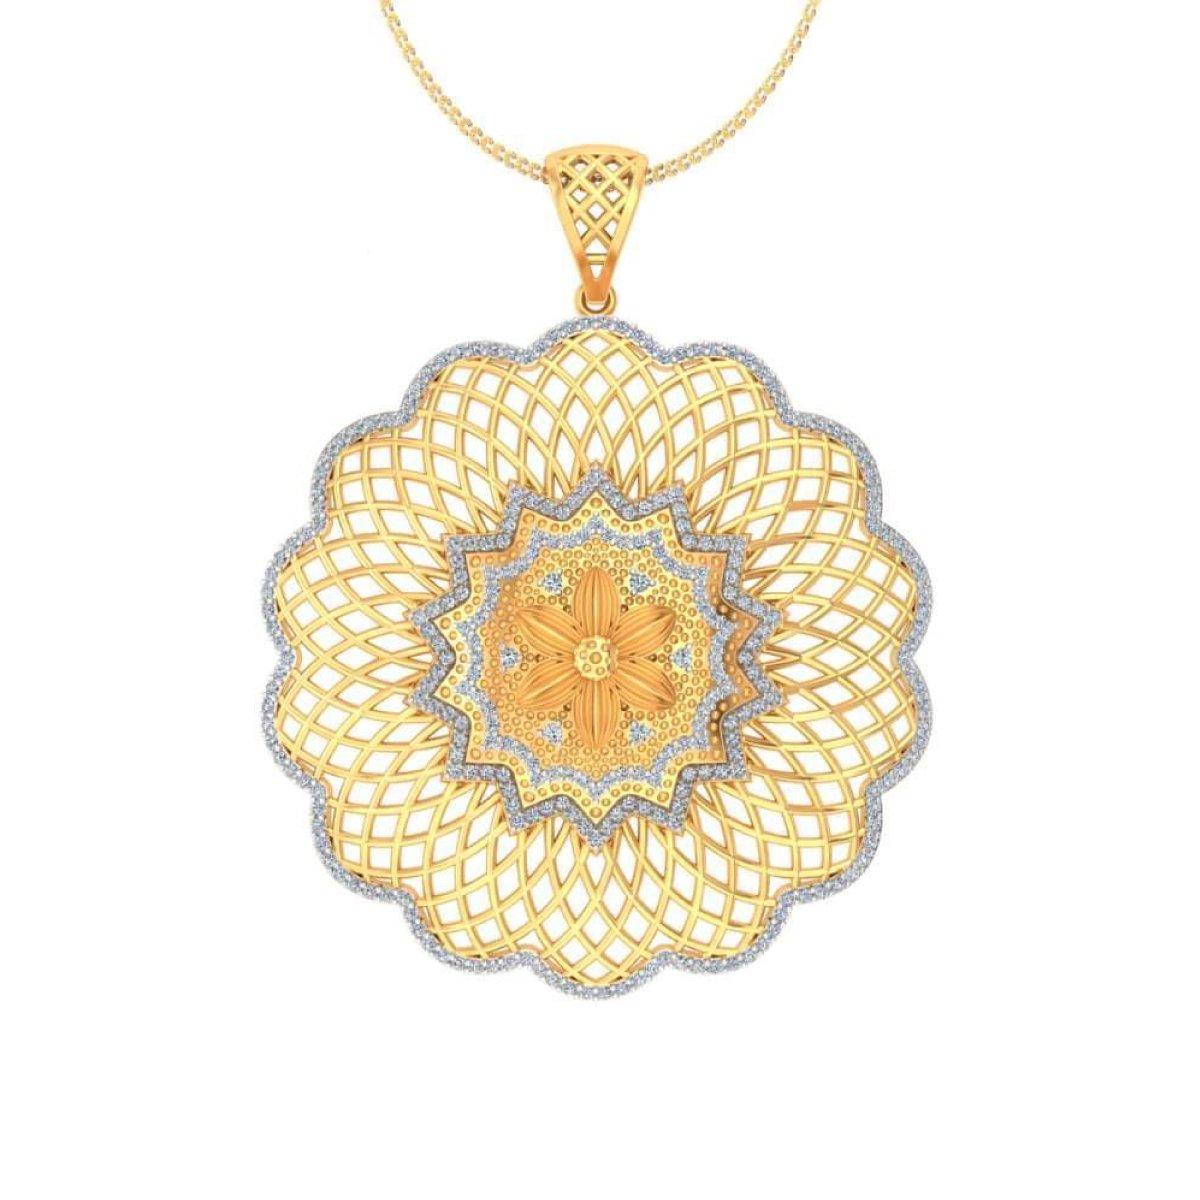 Bloom Gold Pendant